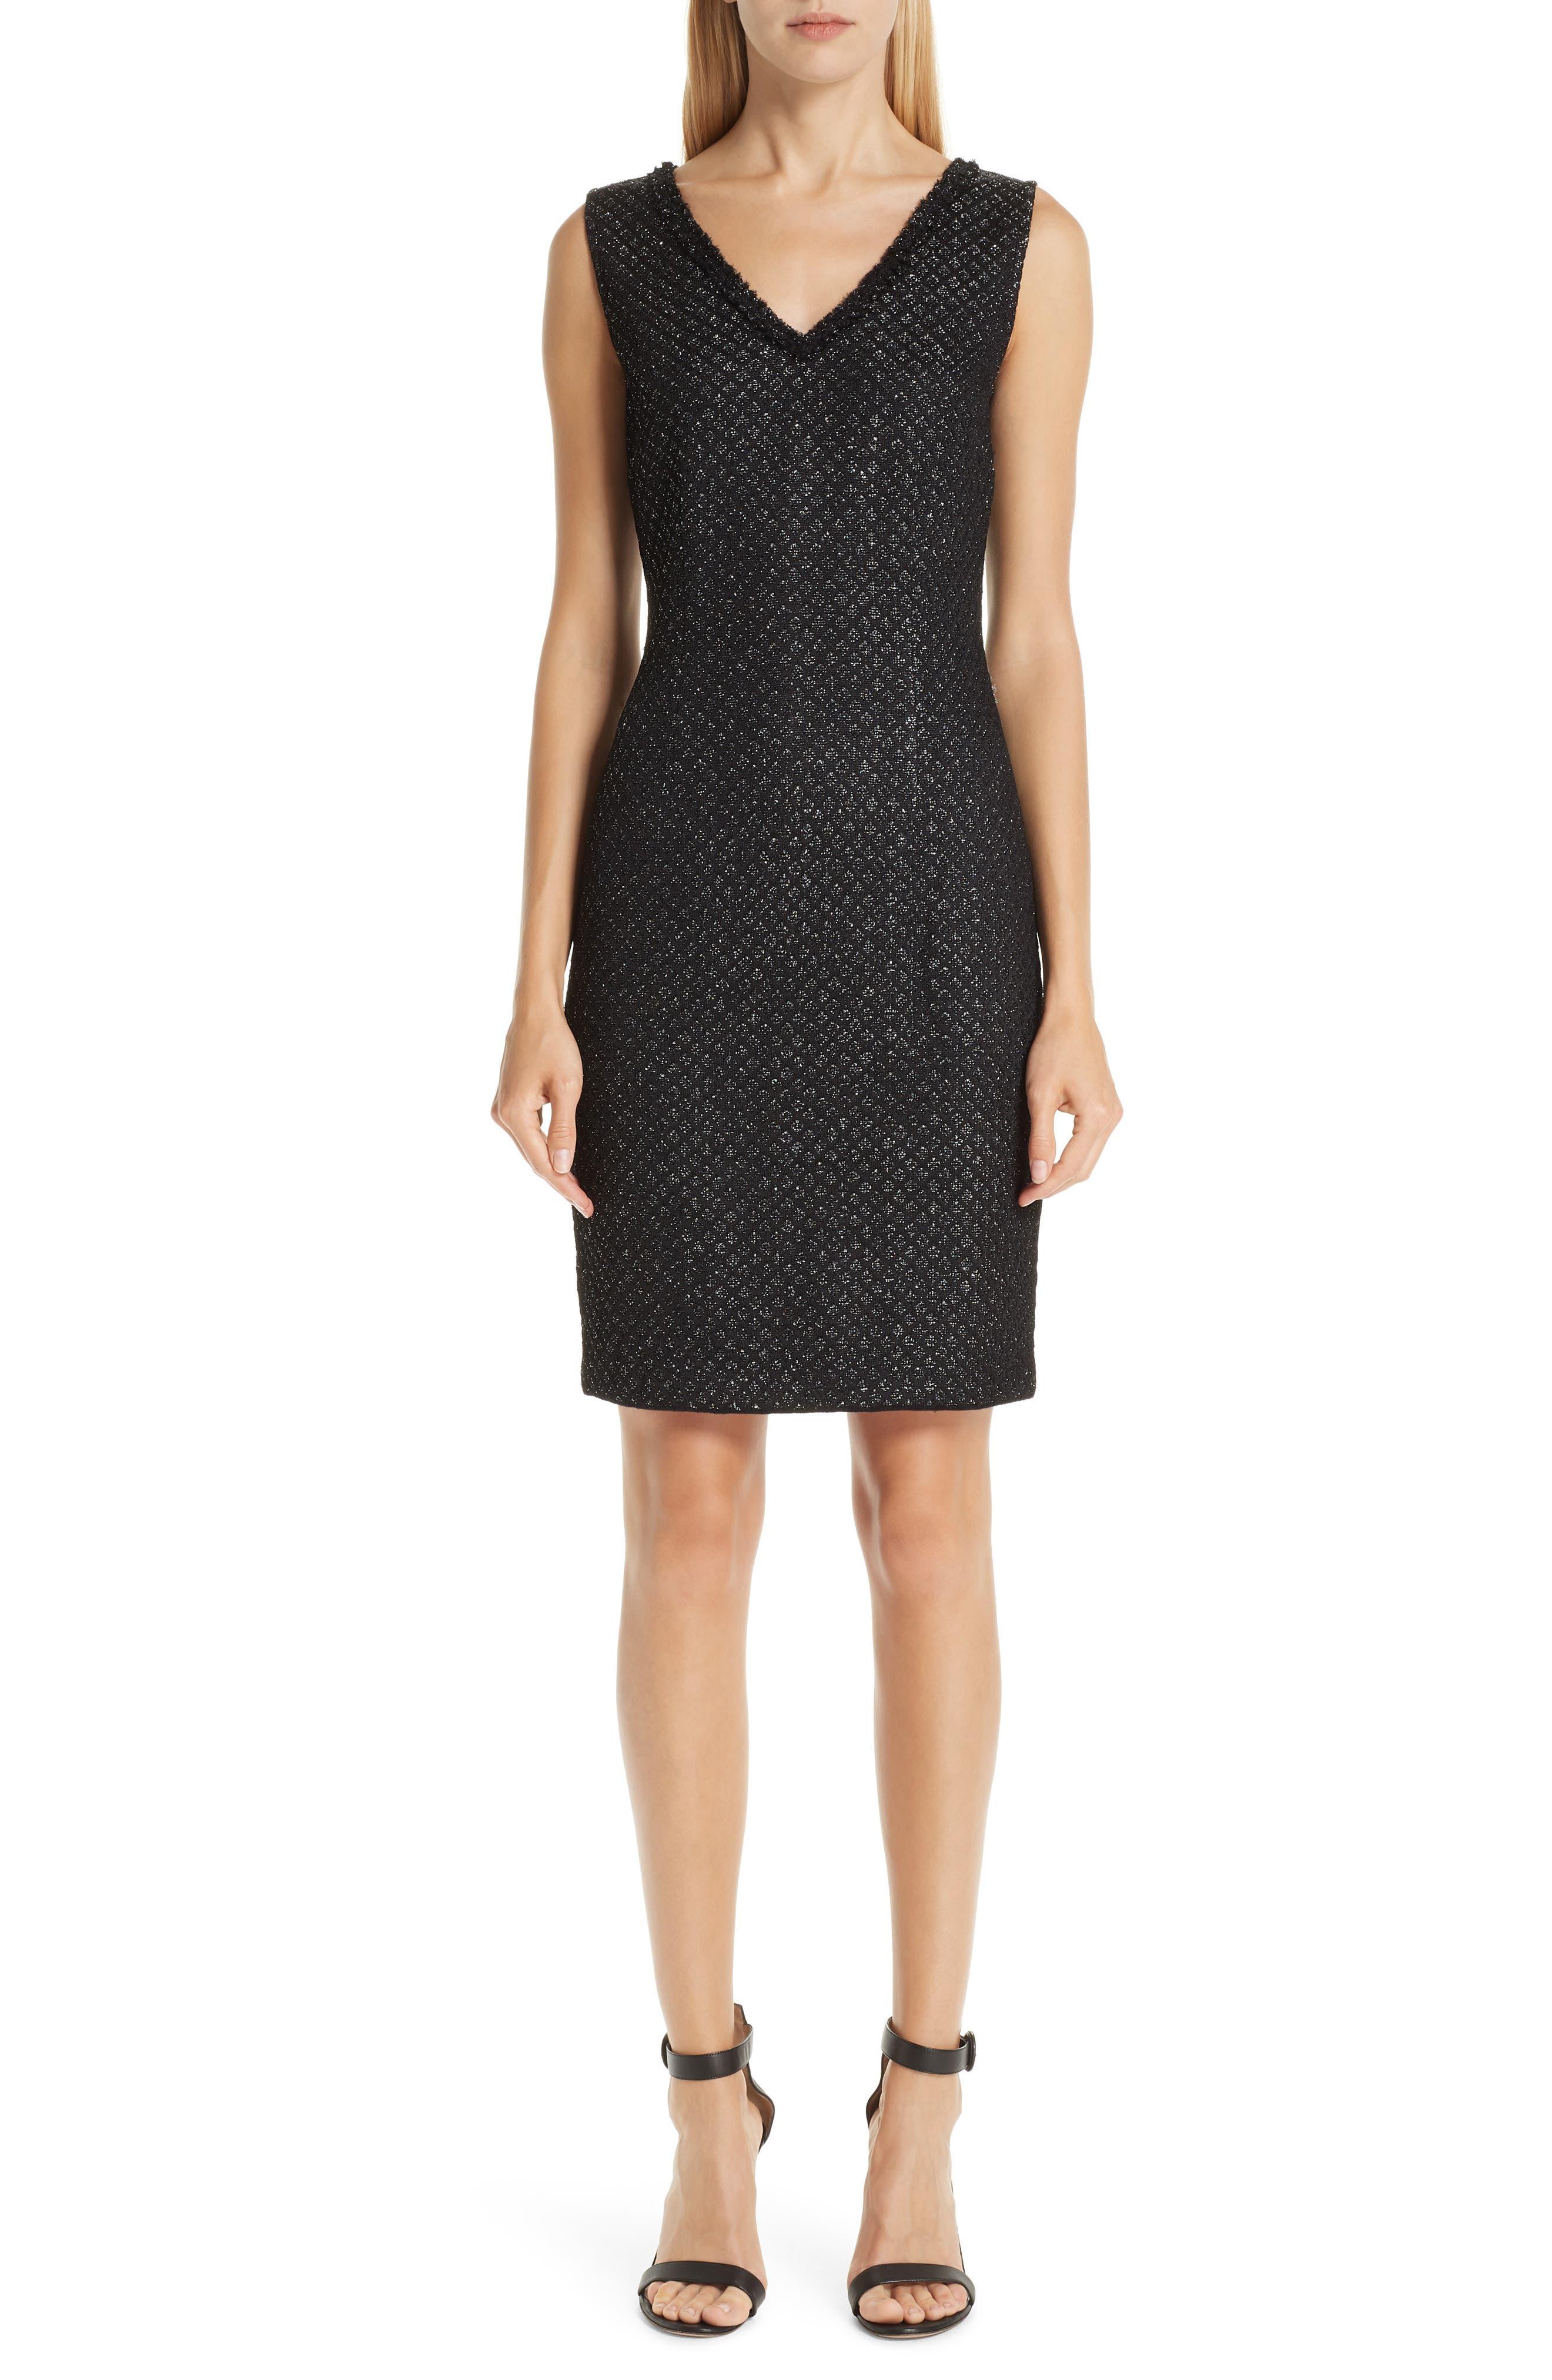 ST. JOHN COLLECTION Shimmer Inlay Brocade Knit Dress, Main, color, CAVIAR/ SILVER